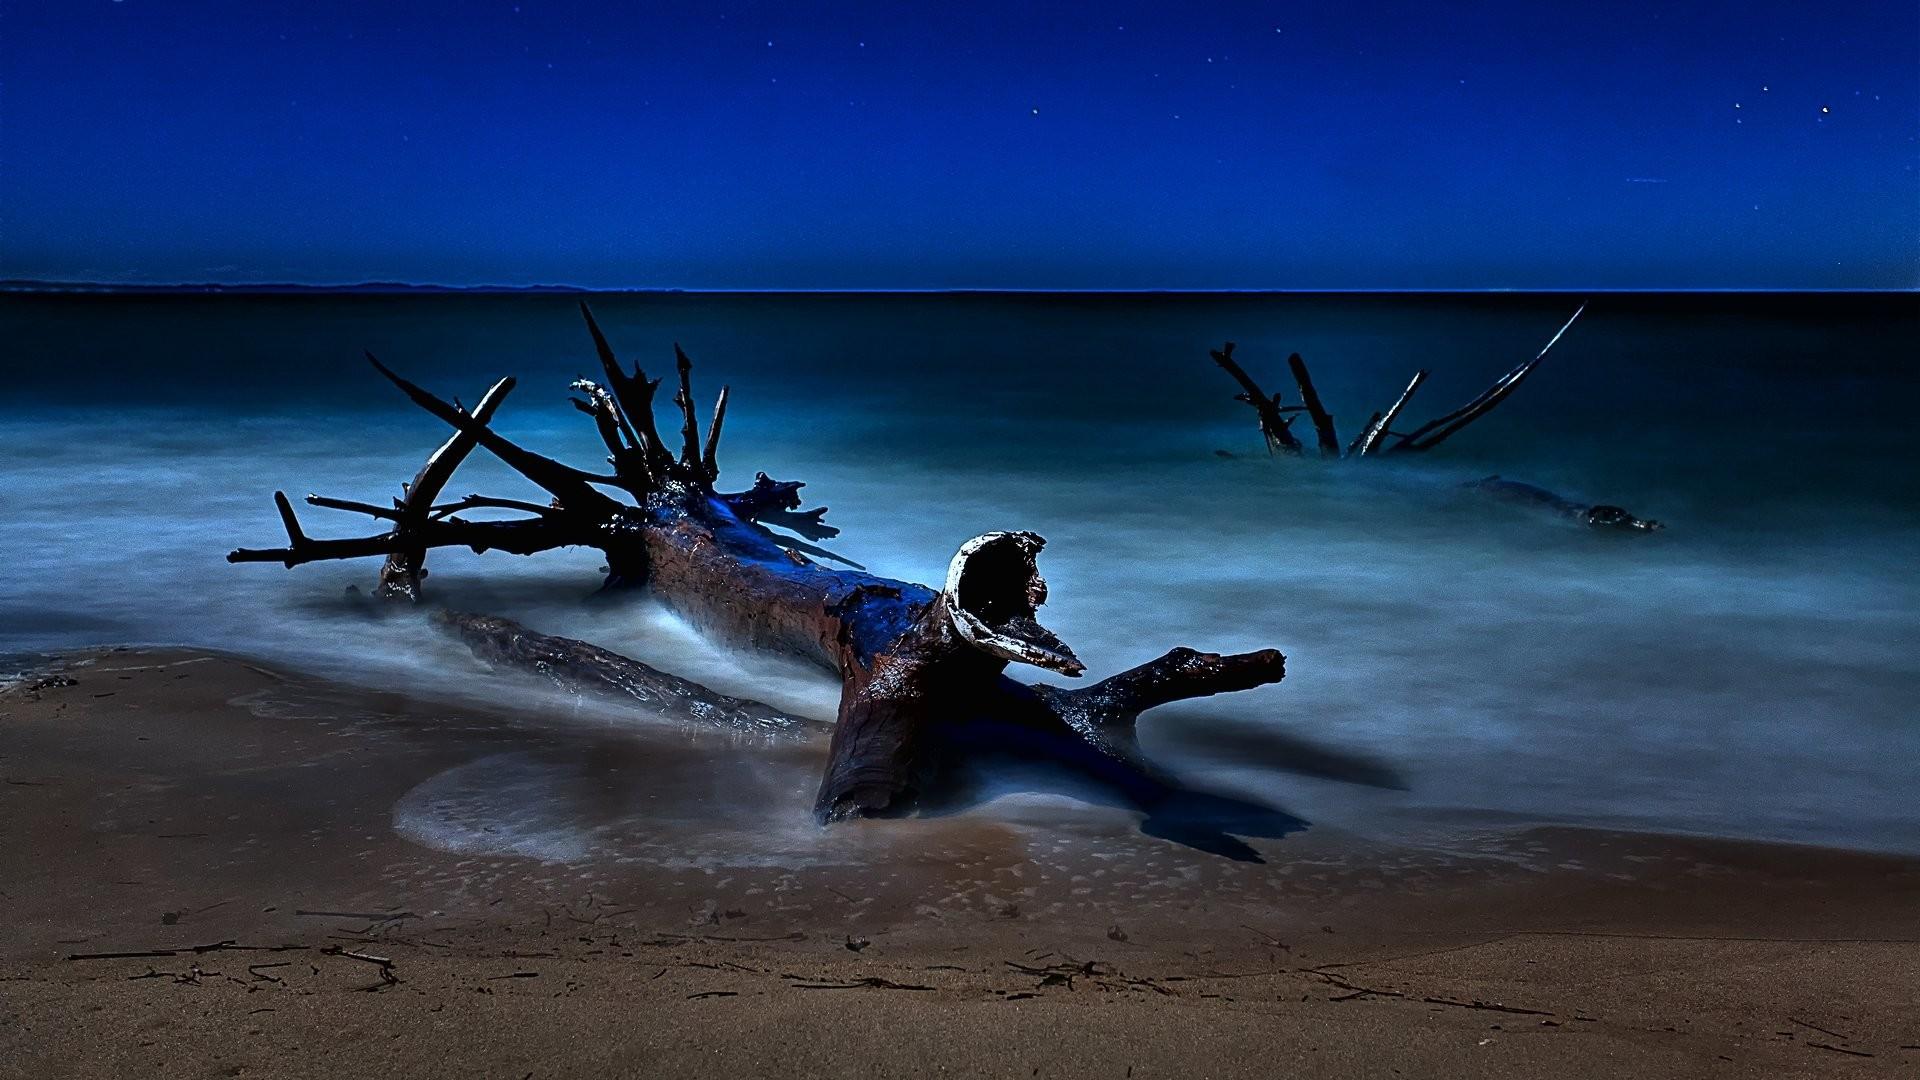 Starry Night 937416